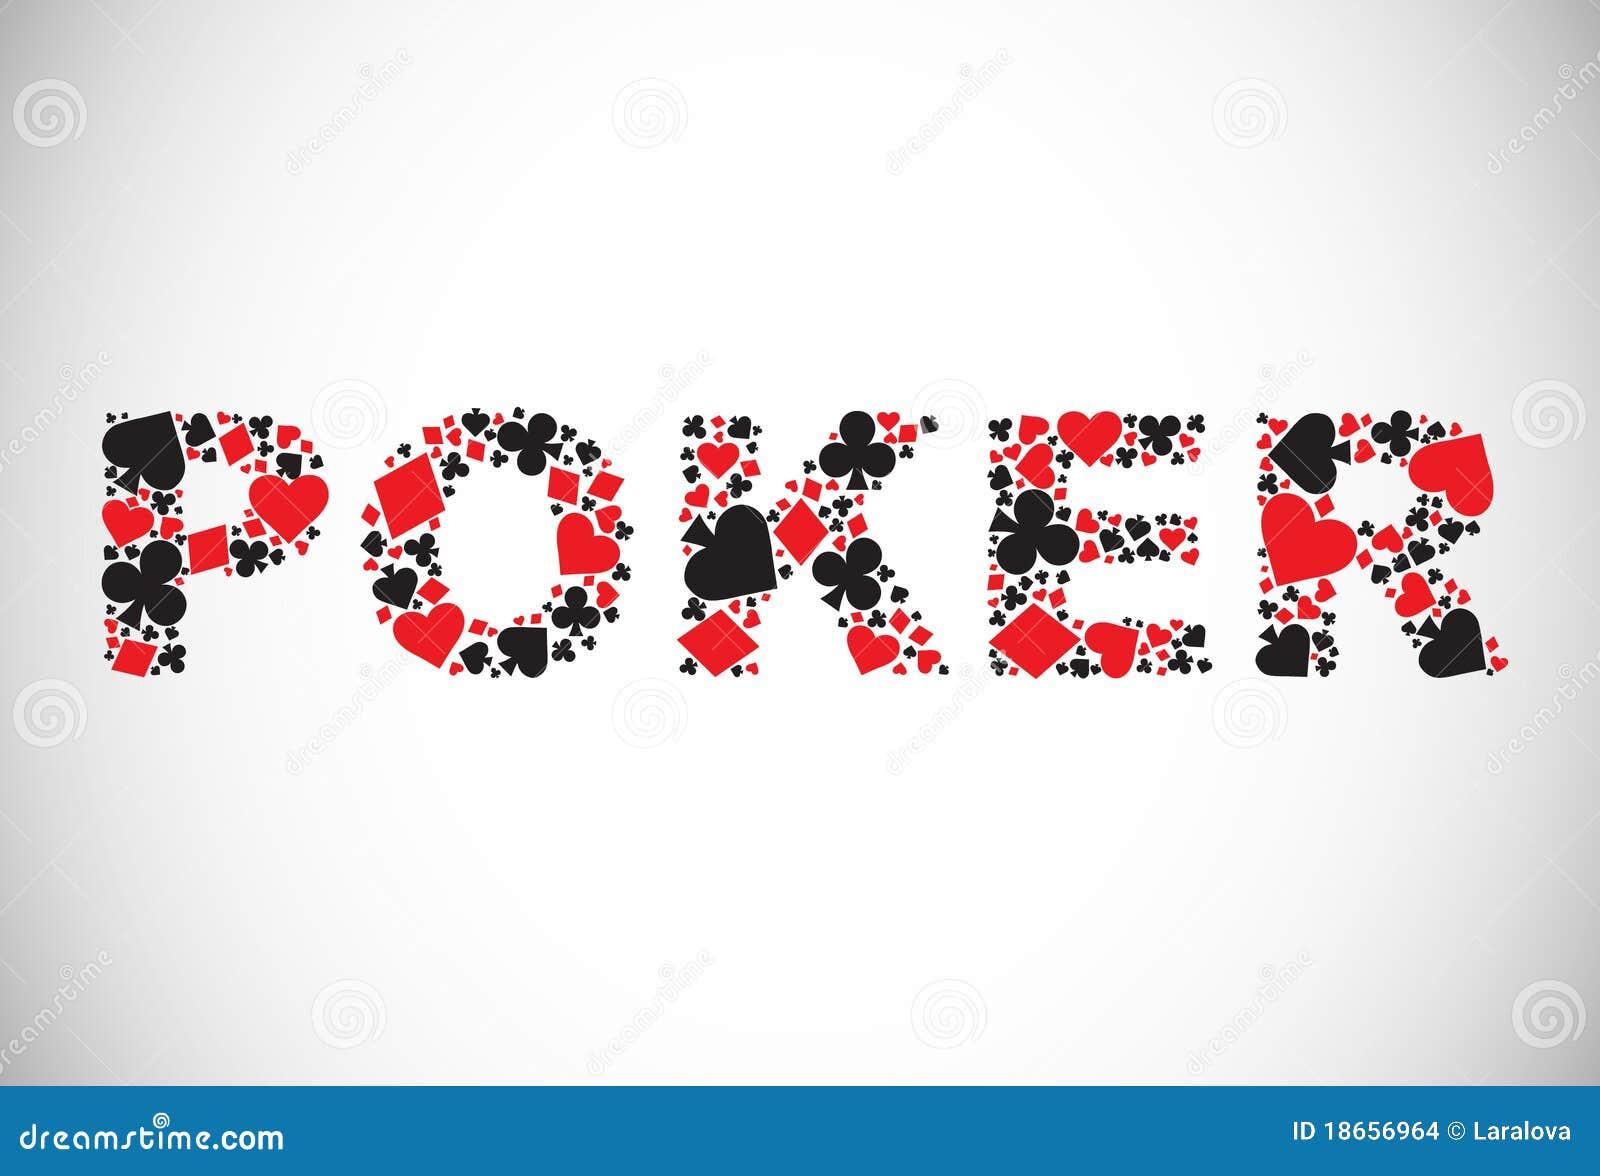 Association poker 93